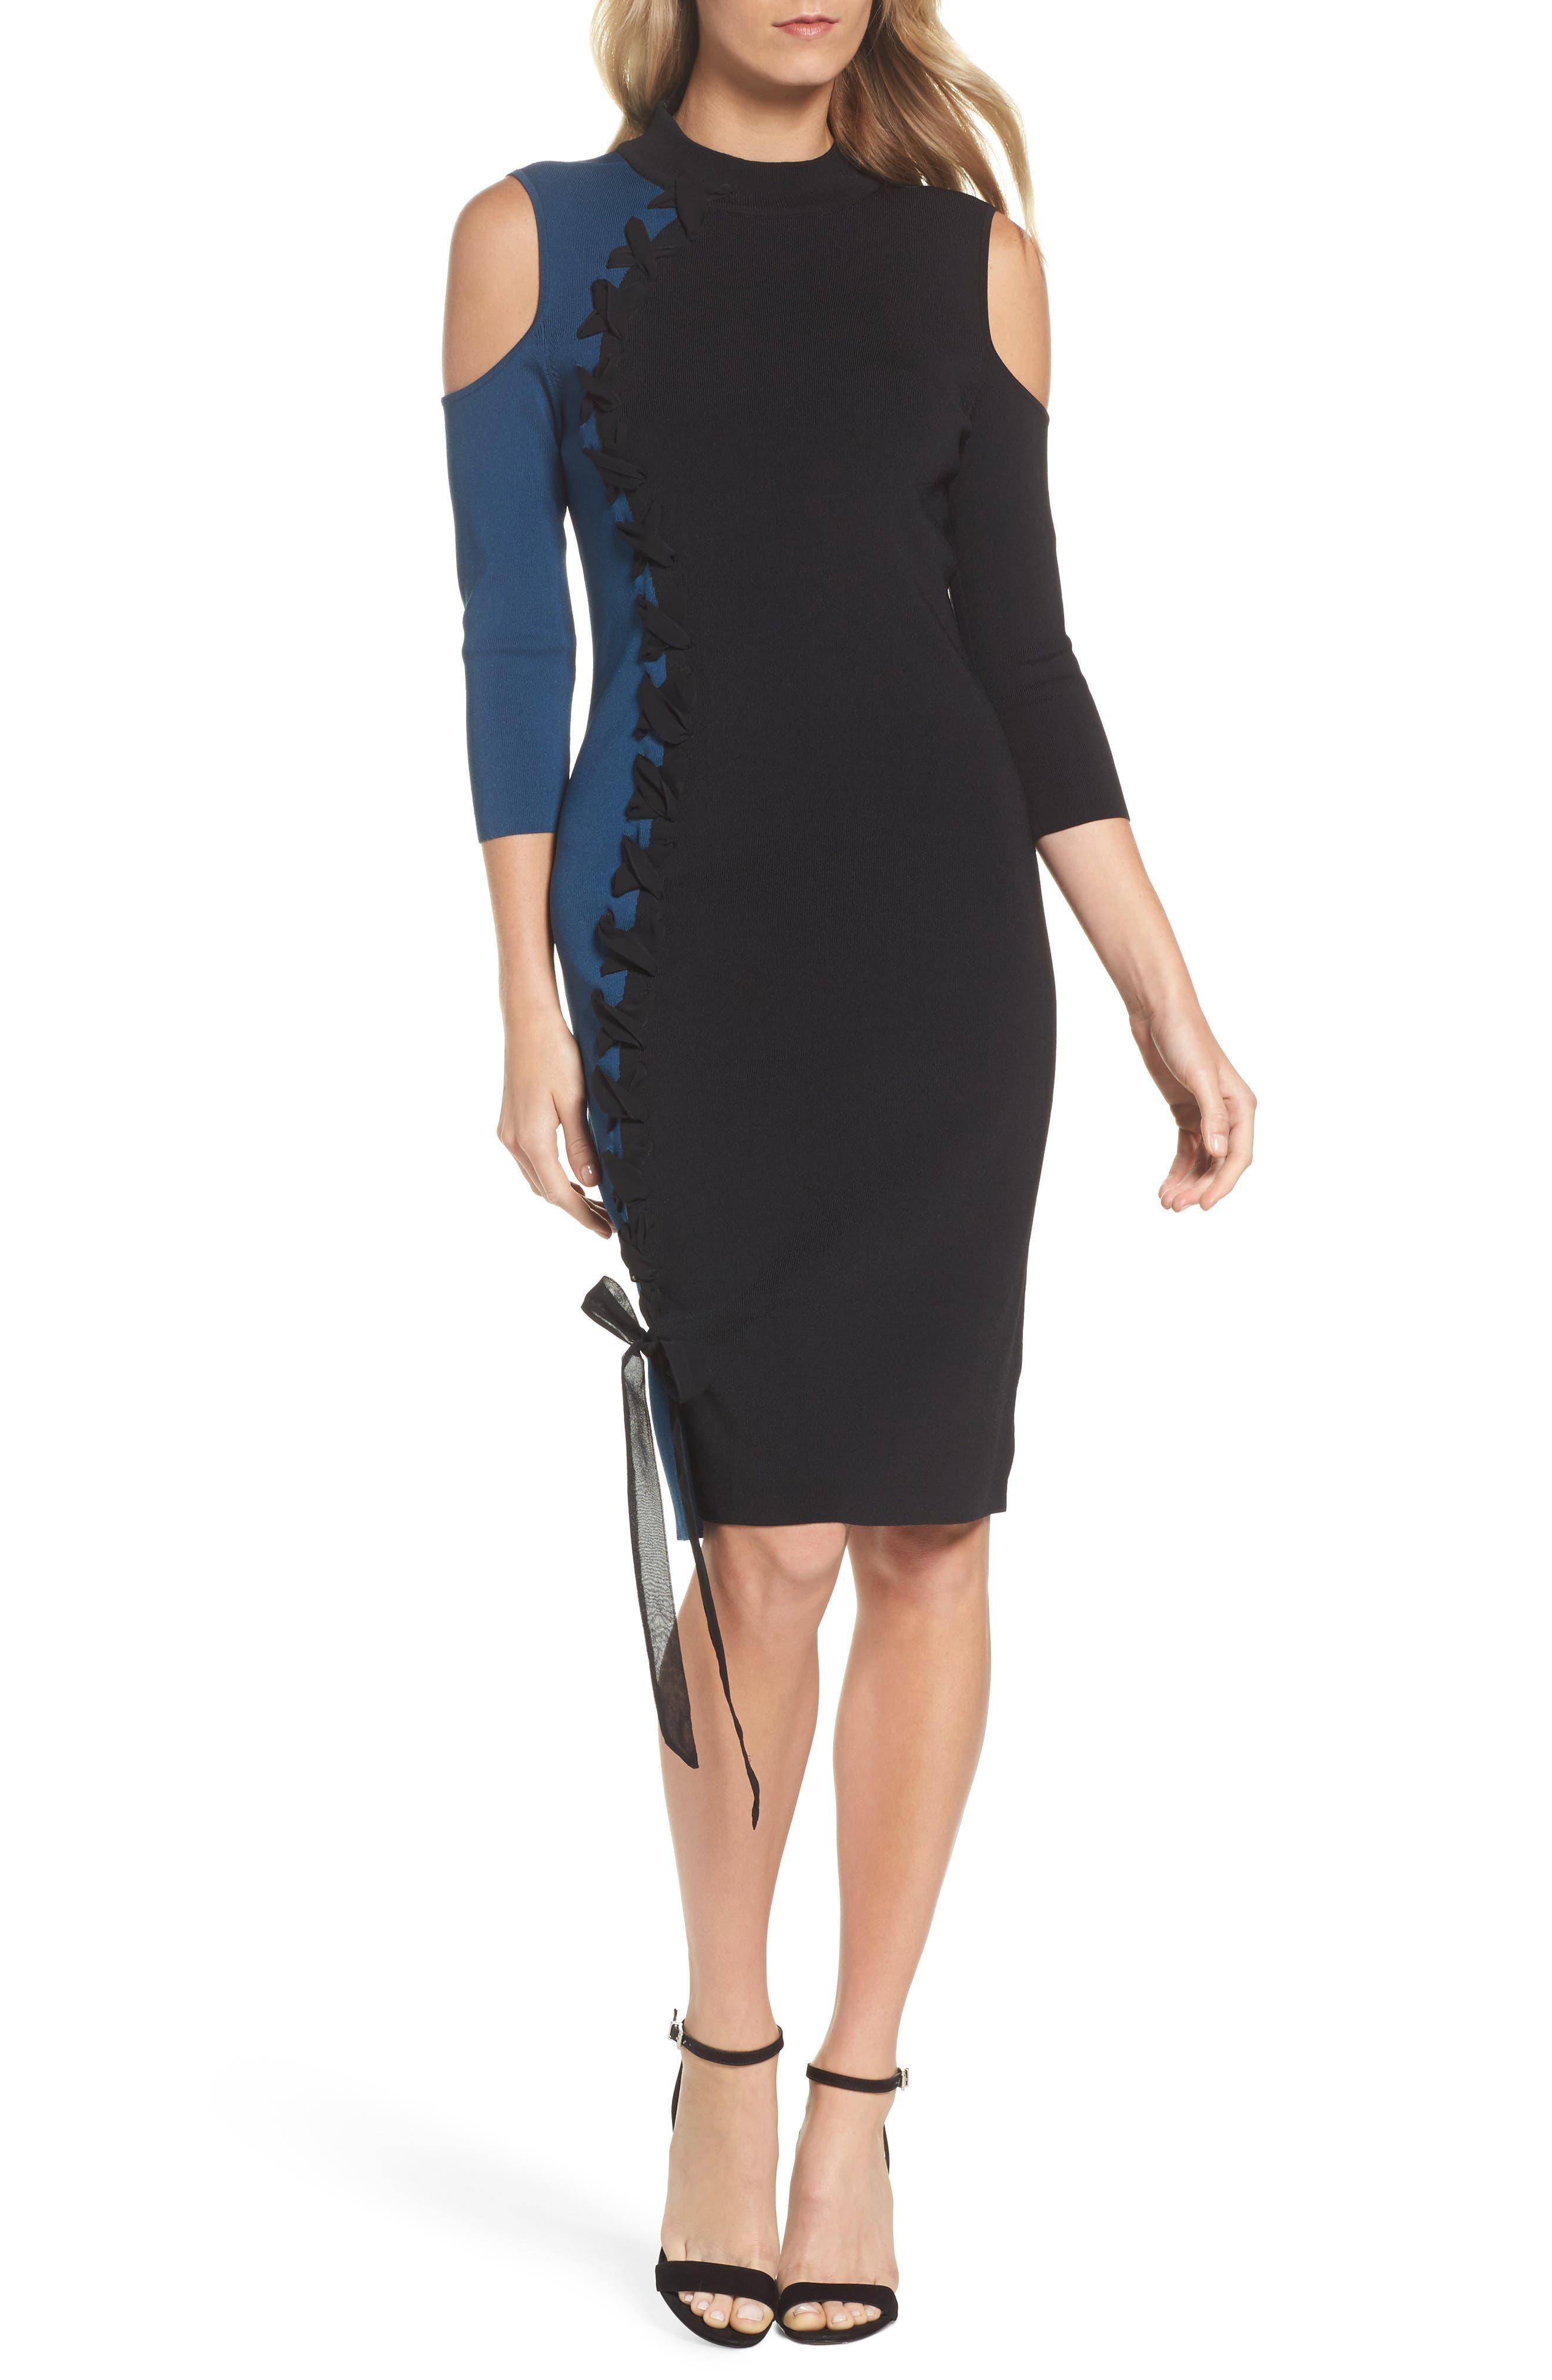 Alternate Image 1 Selected - NIC+ZOE Swirl Cold Shoulder Dress